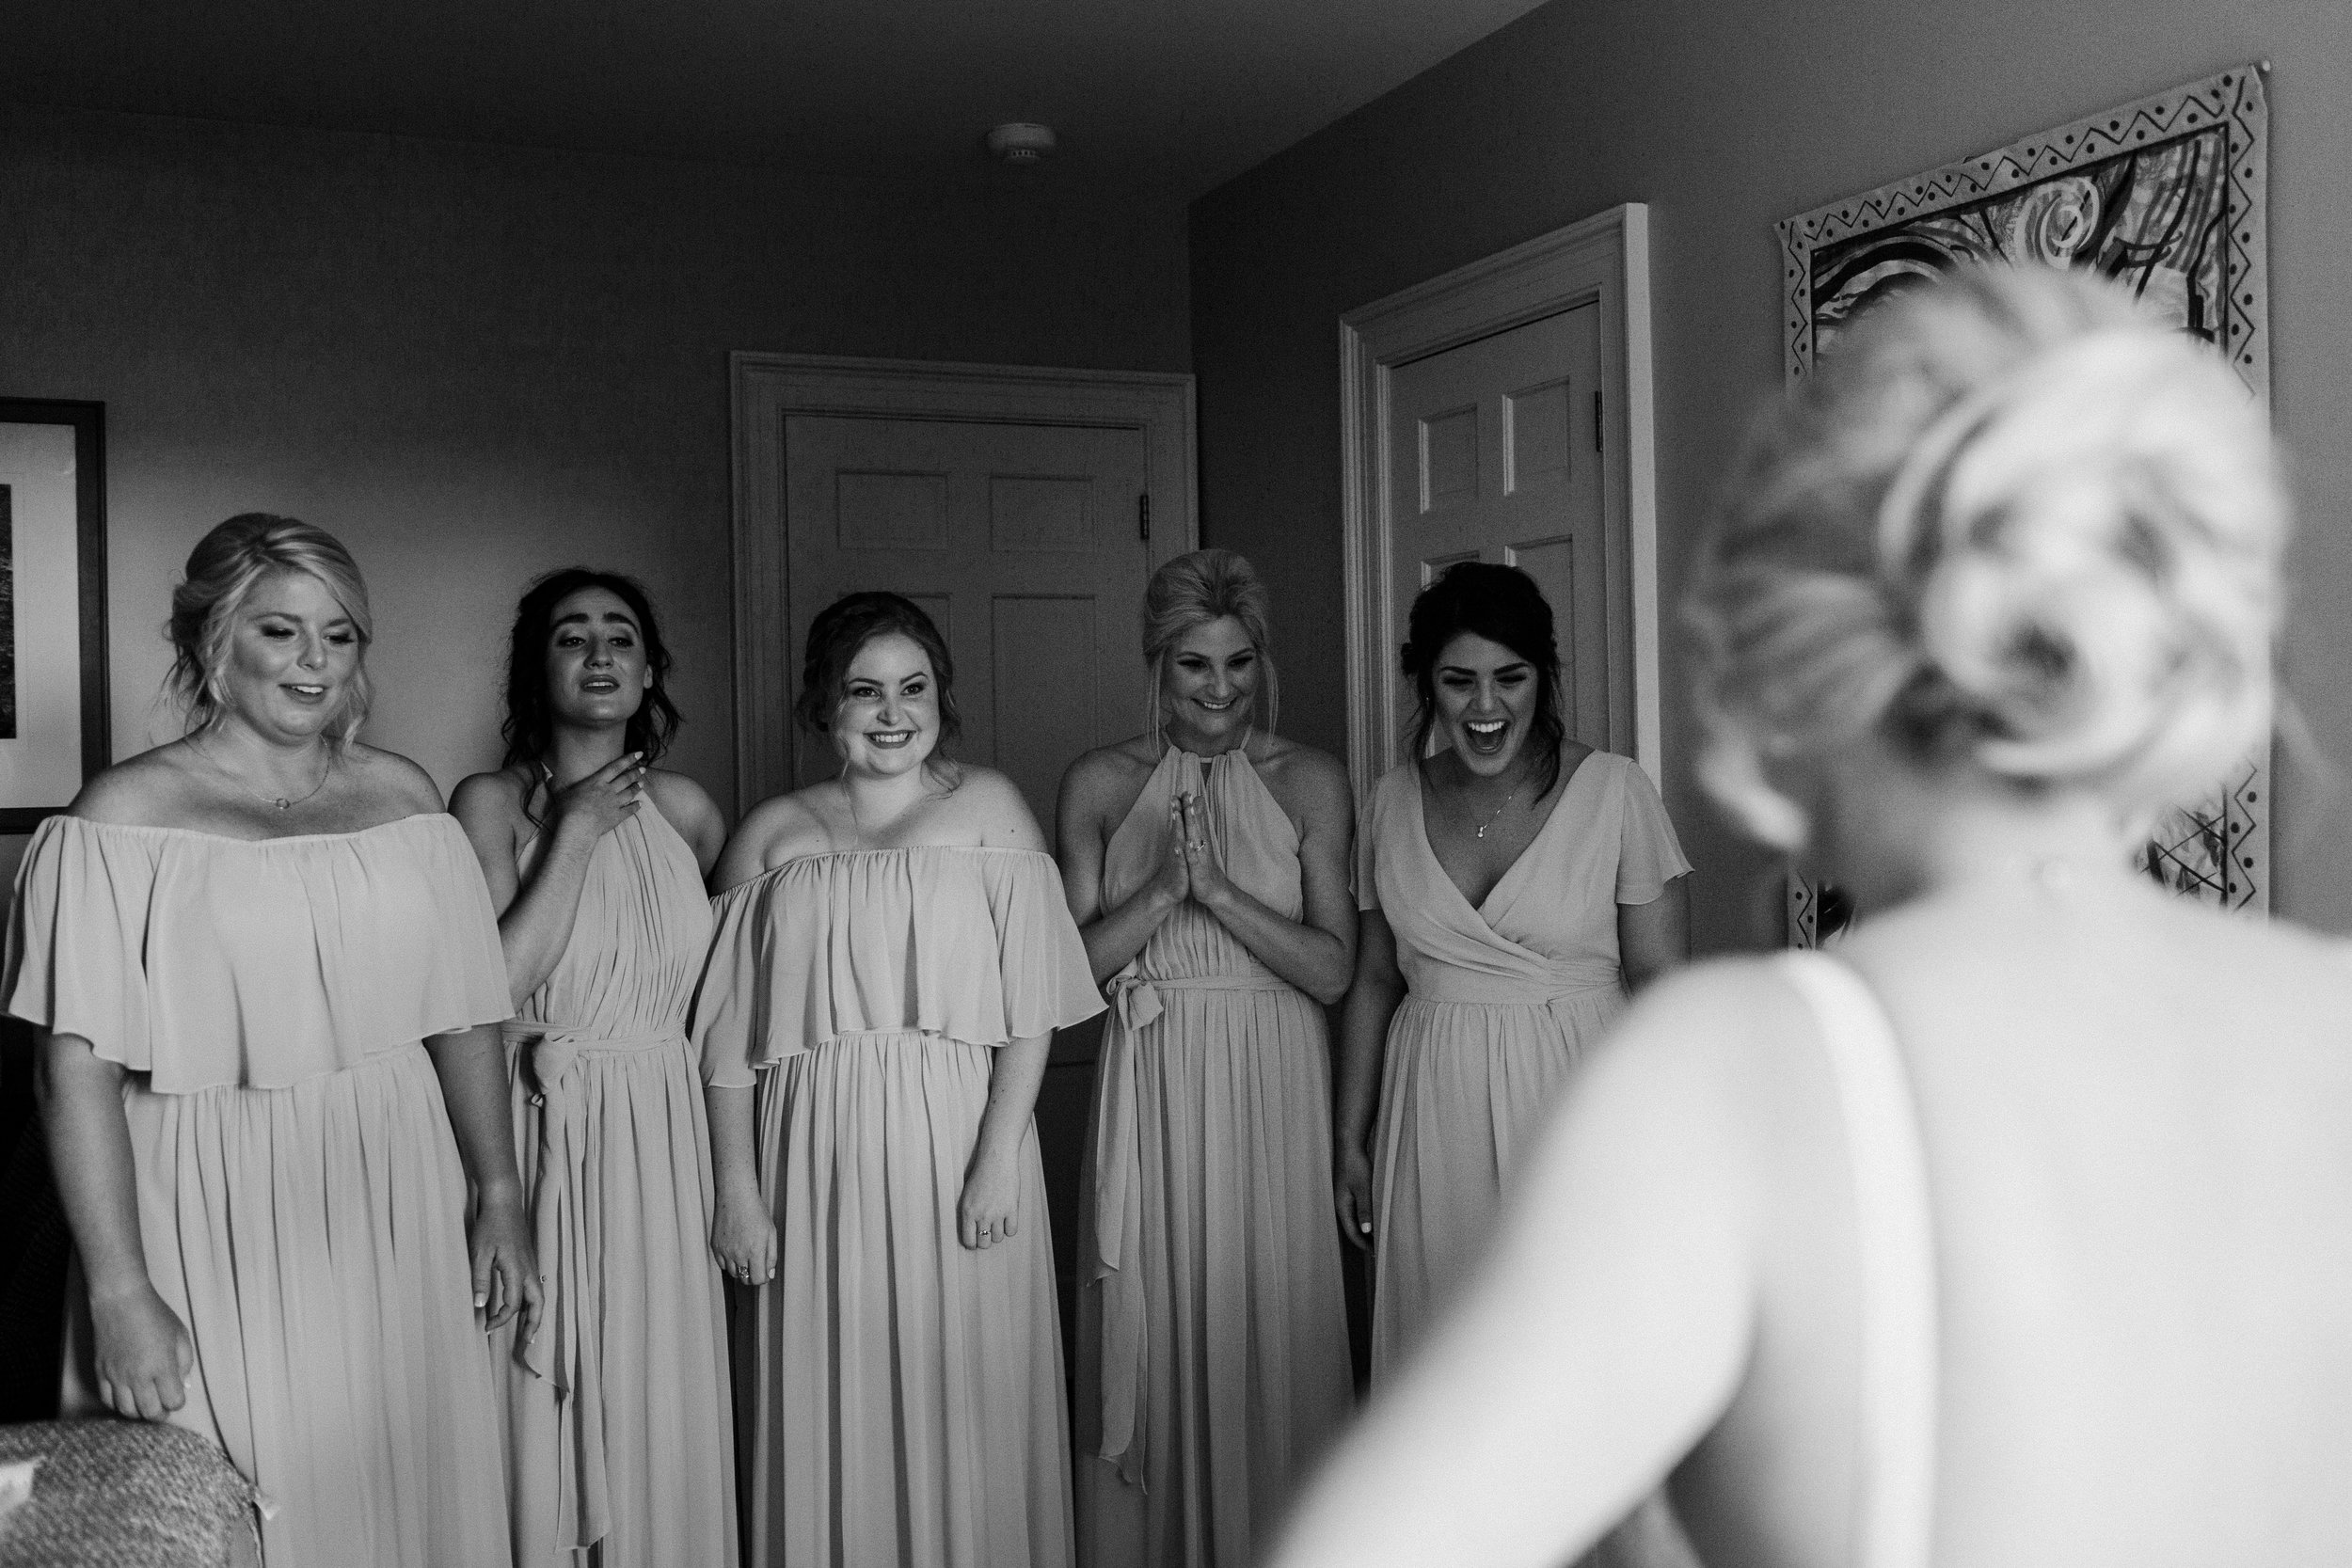 knoxville-wedding-photographer-169.JPG